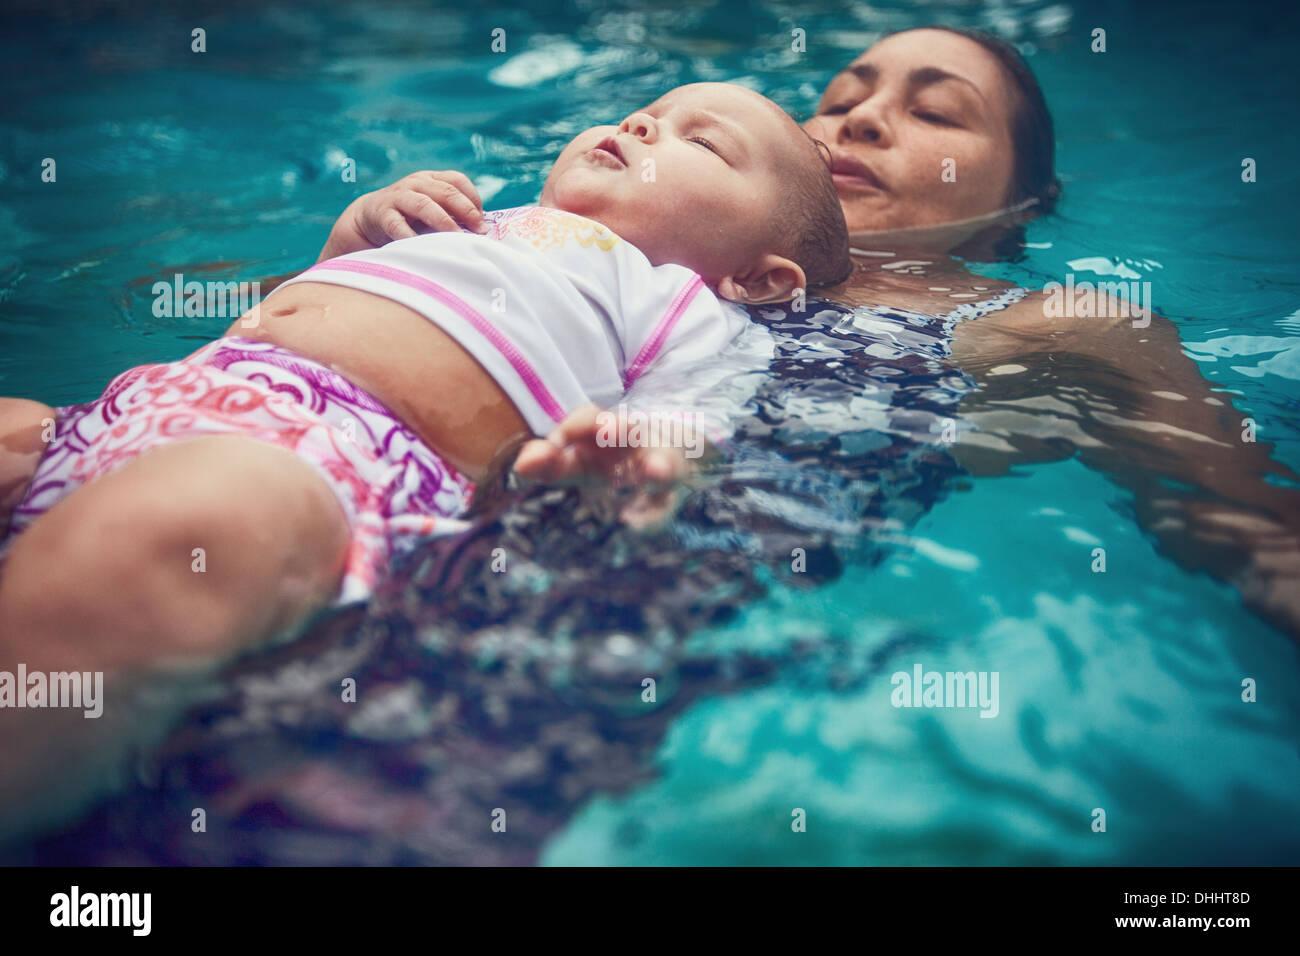 Madre e hija flotando sobre la espalda en el agua Imagen De Stock